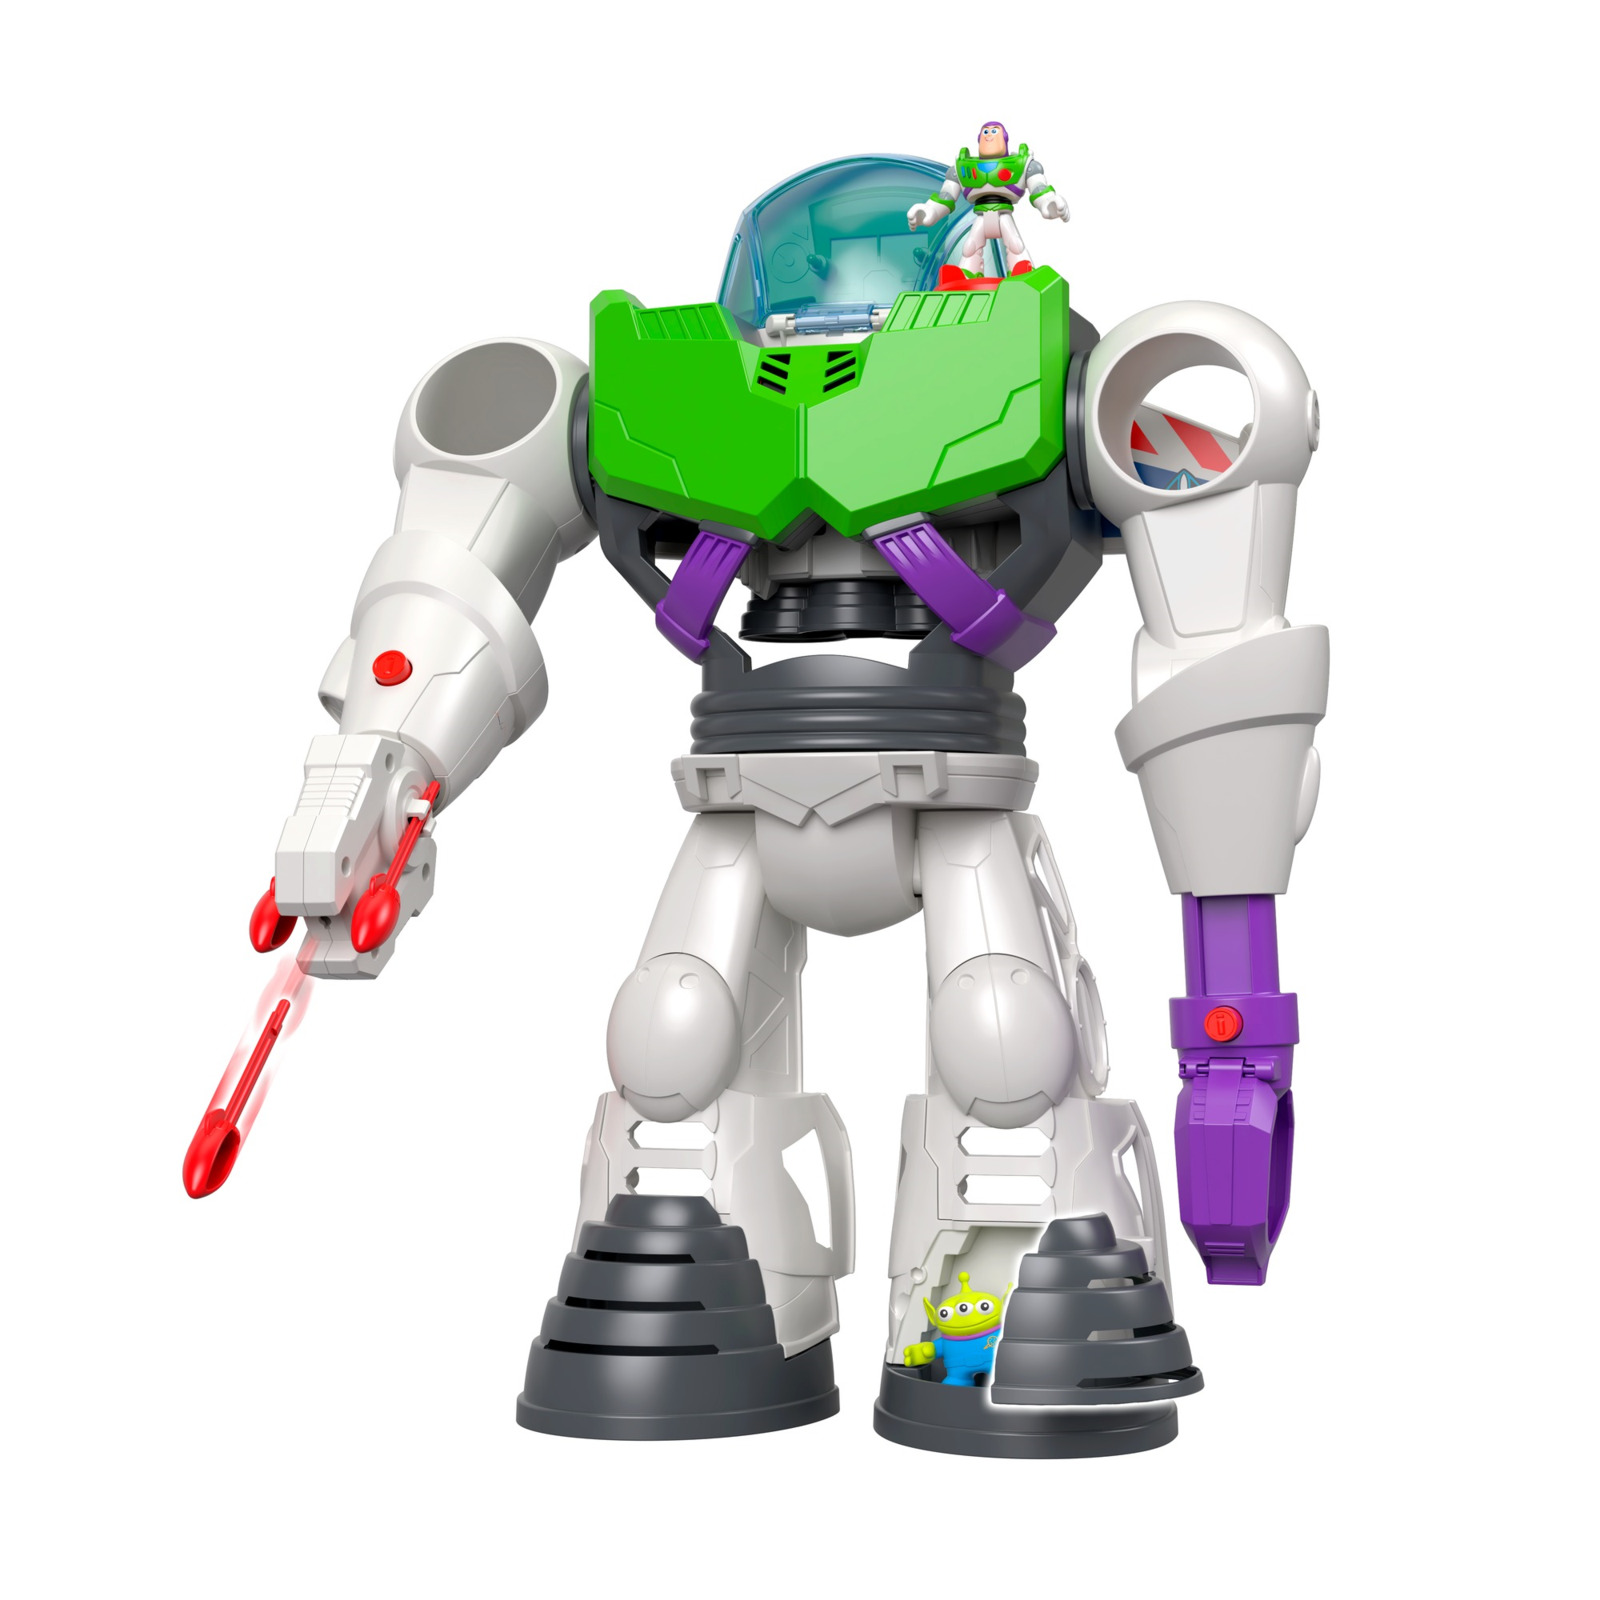 Фигурка Imaginext История игрушек-4 Базз Лайтер, GBG65 imaginext фигурка dc super friends